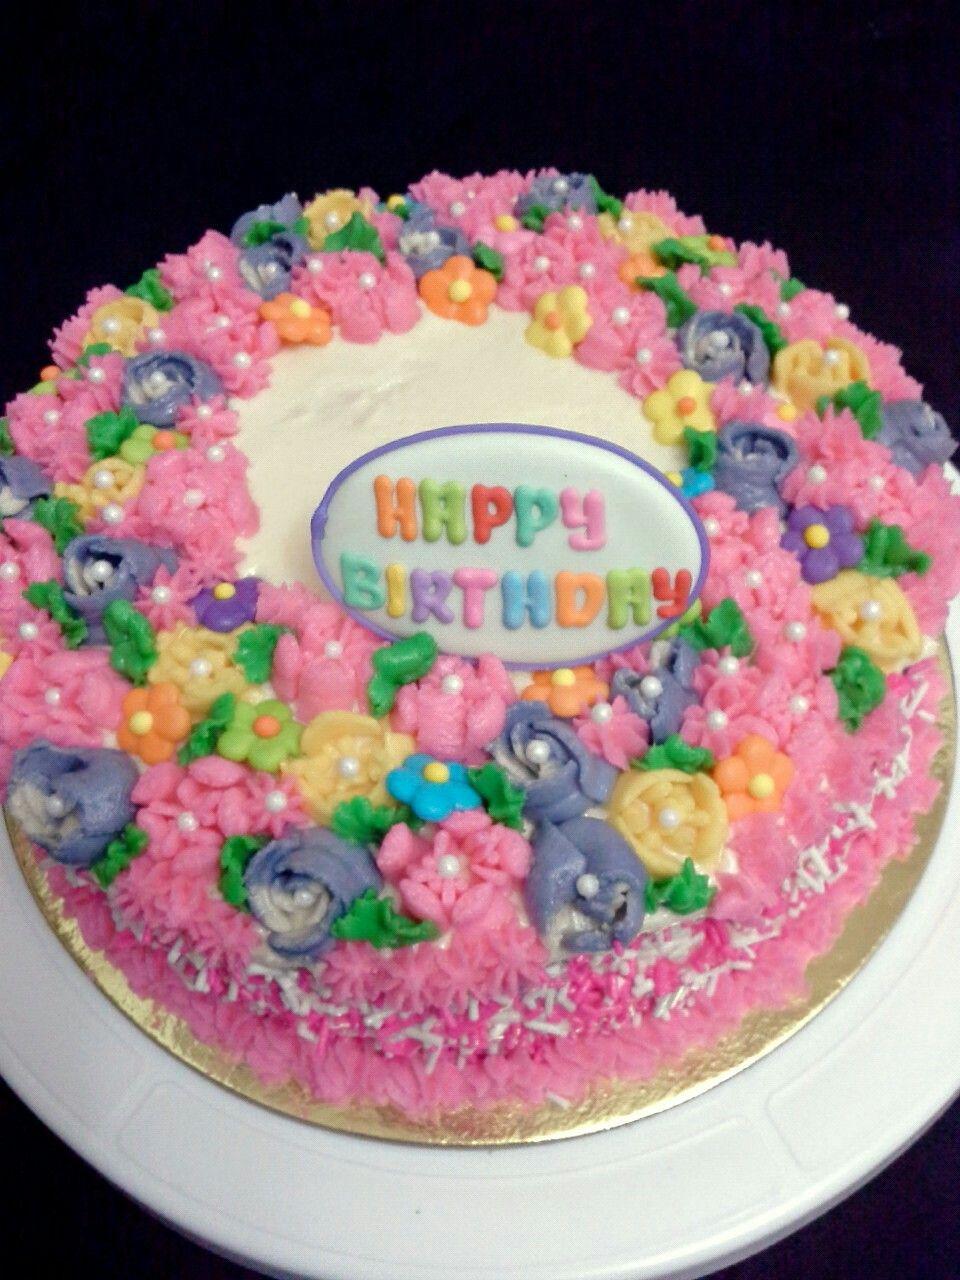 Flower birthday cake JoyceofBaking joyce of baking Pinterest